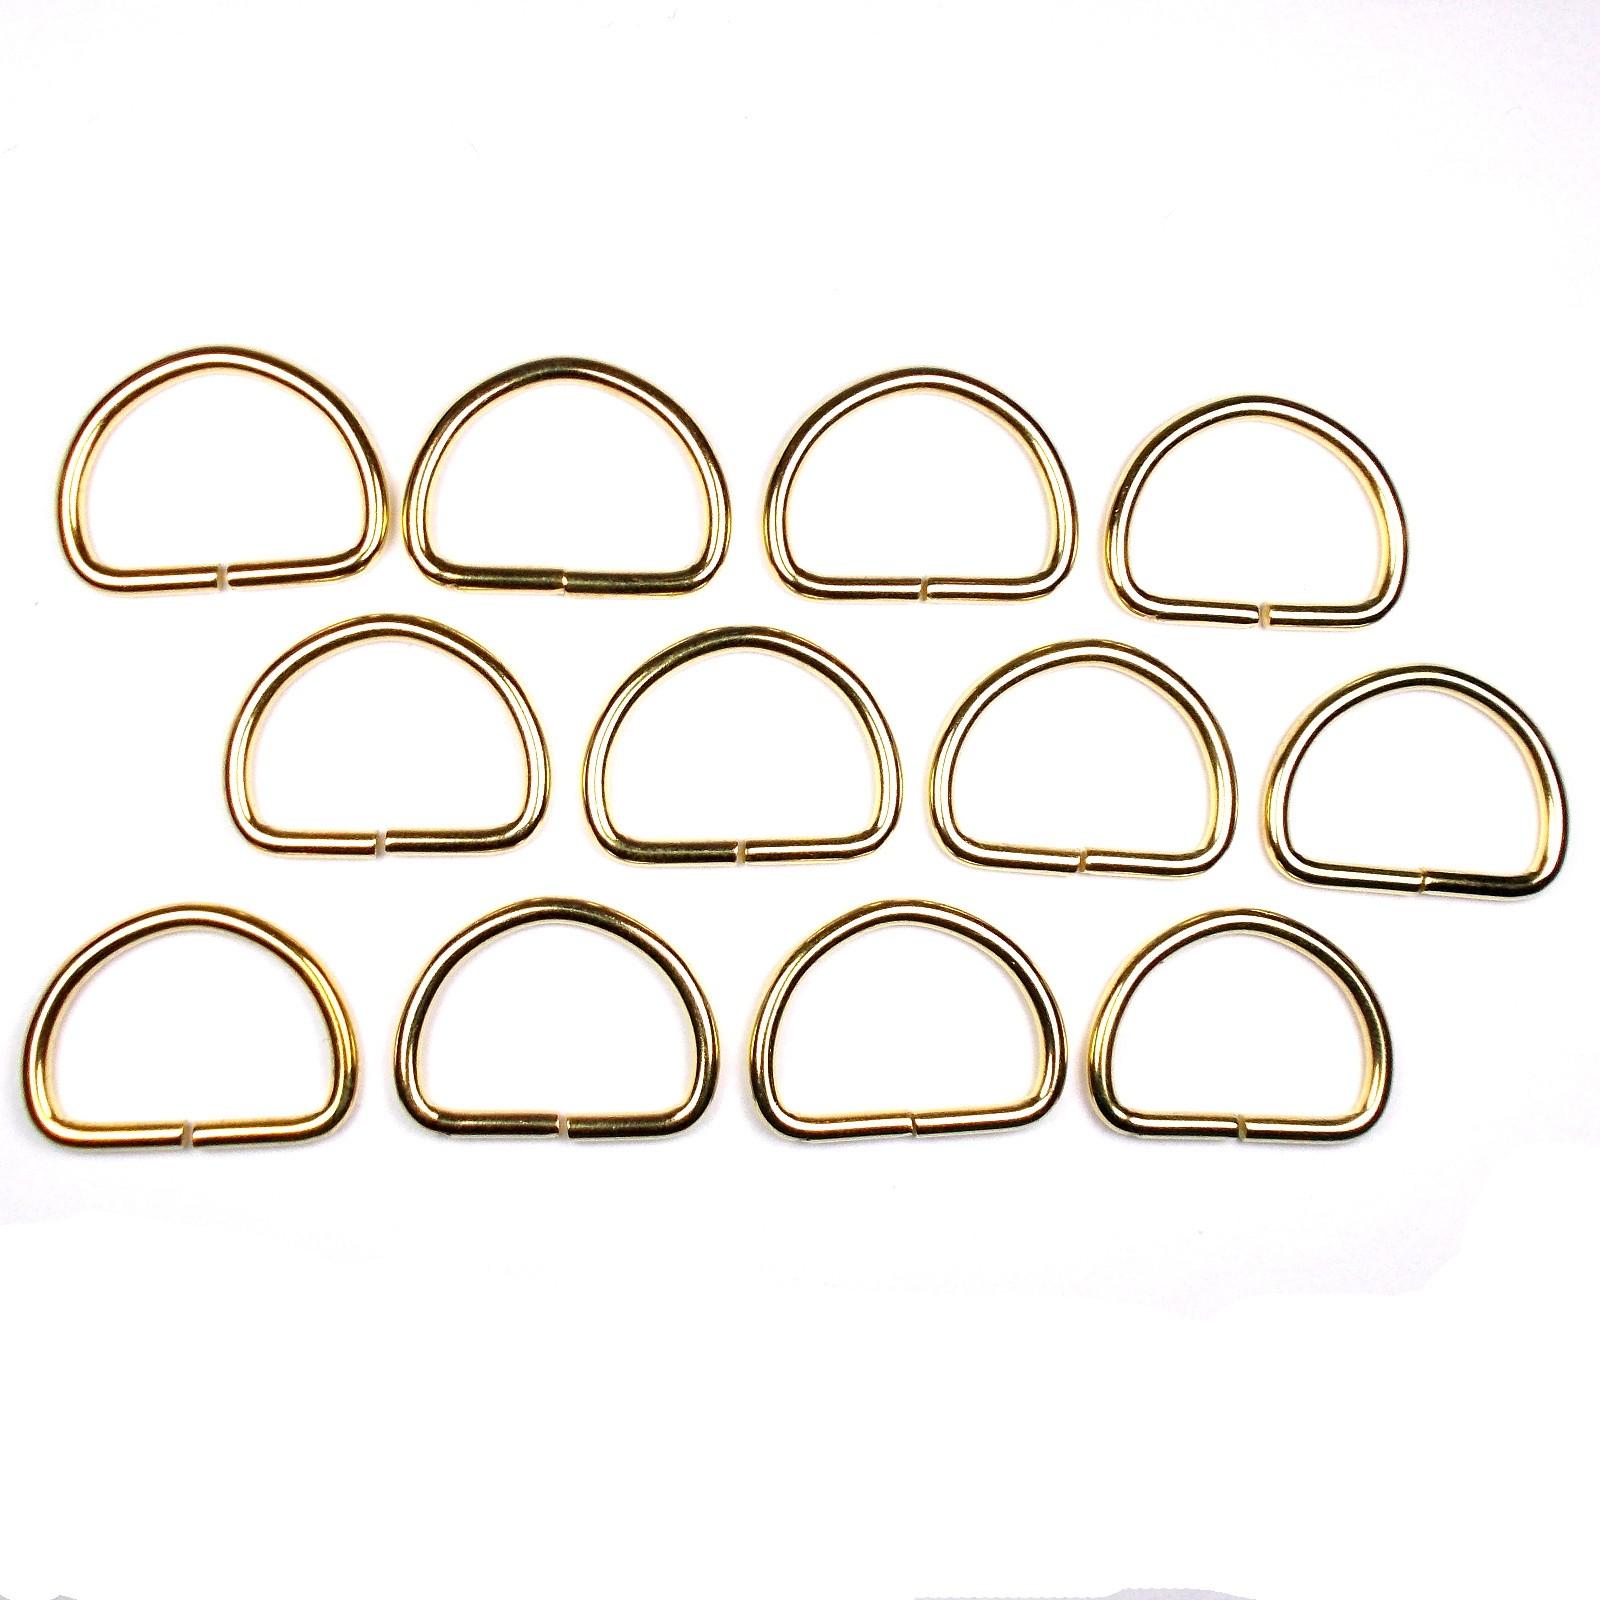 Gold Metal D Rings 47mm Pack of 12